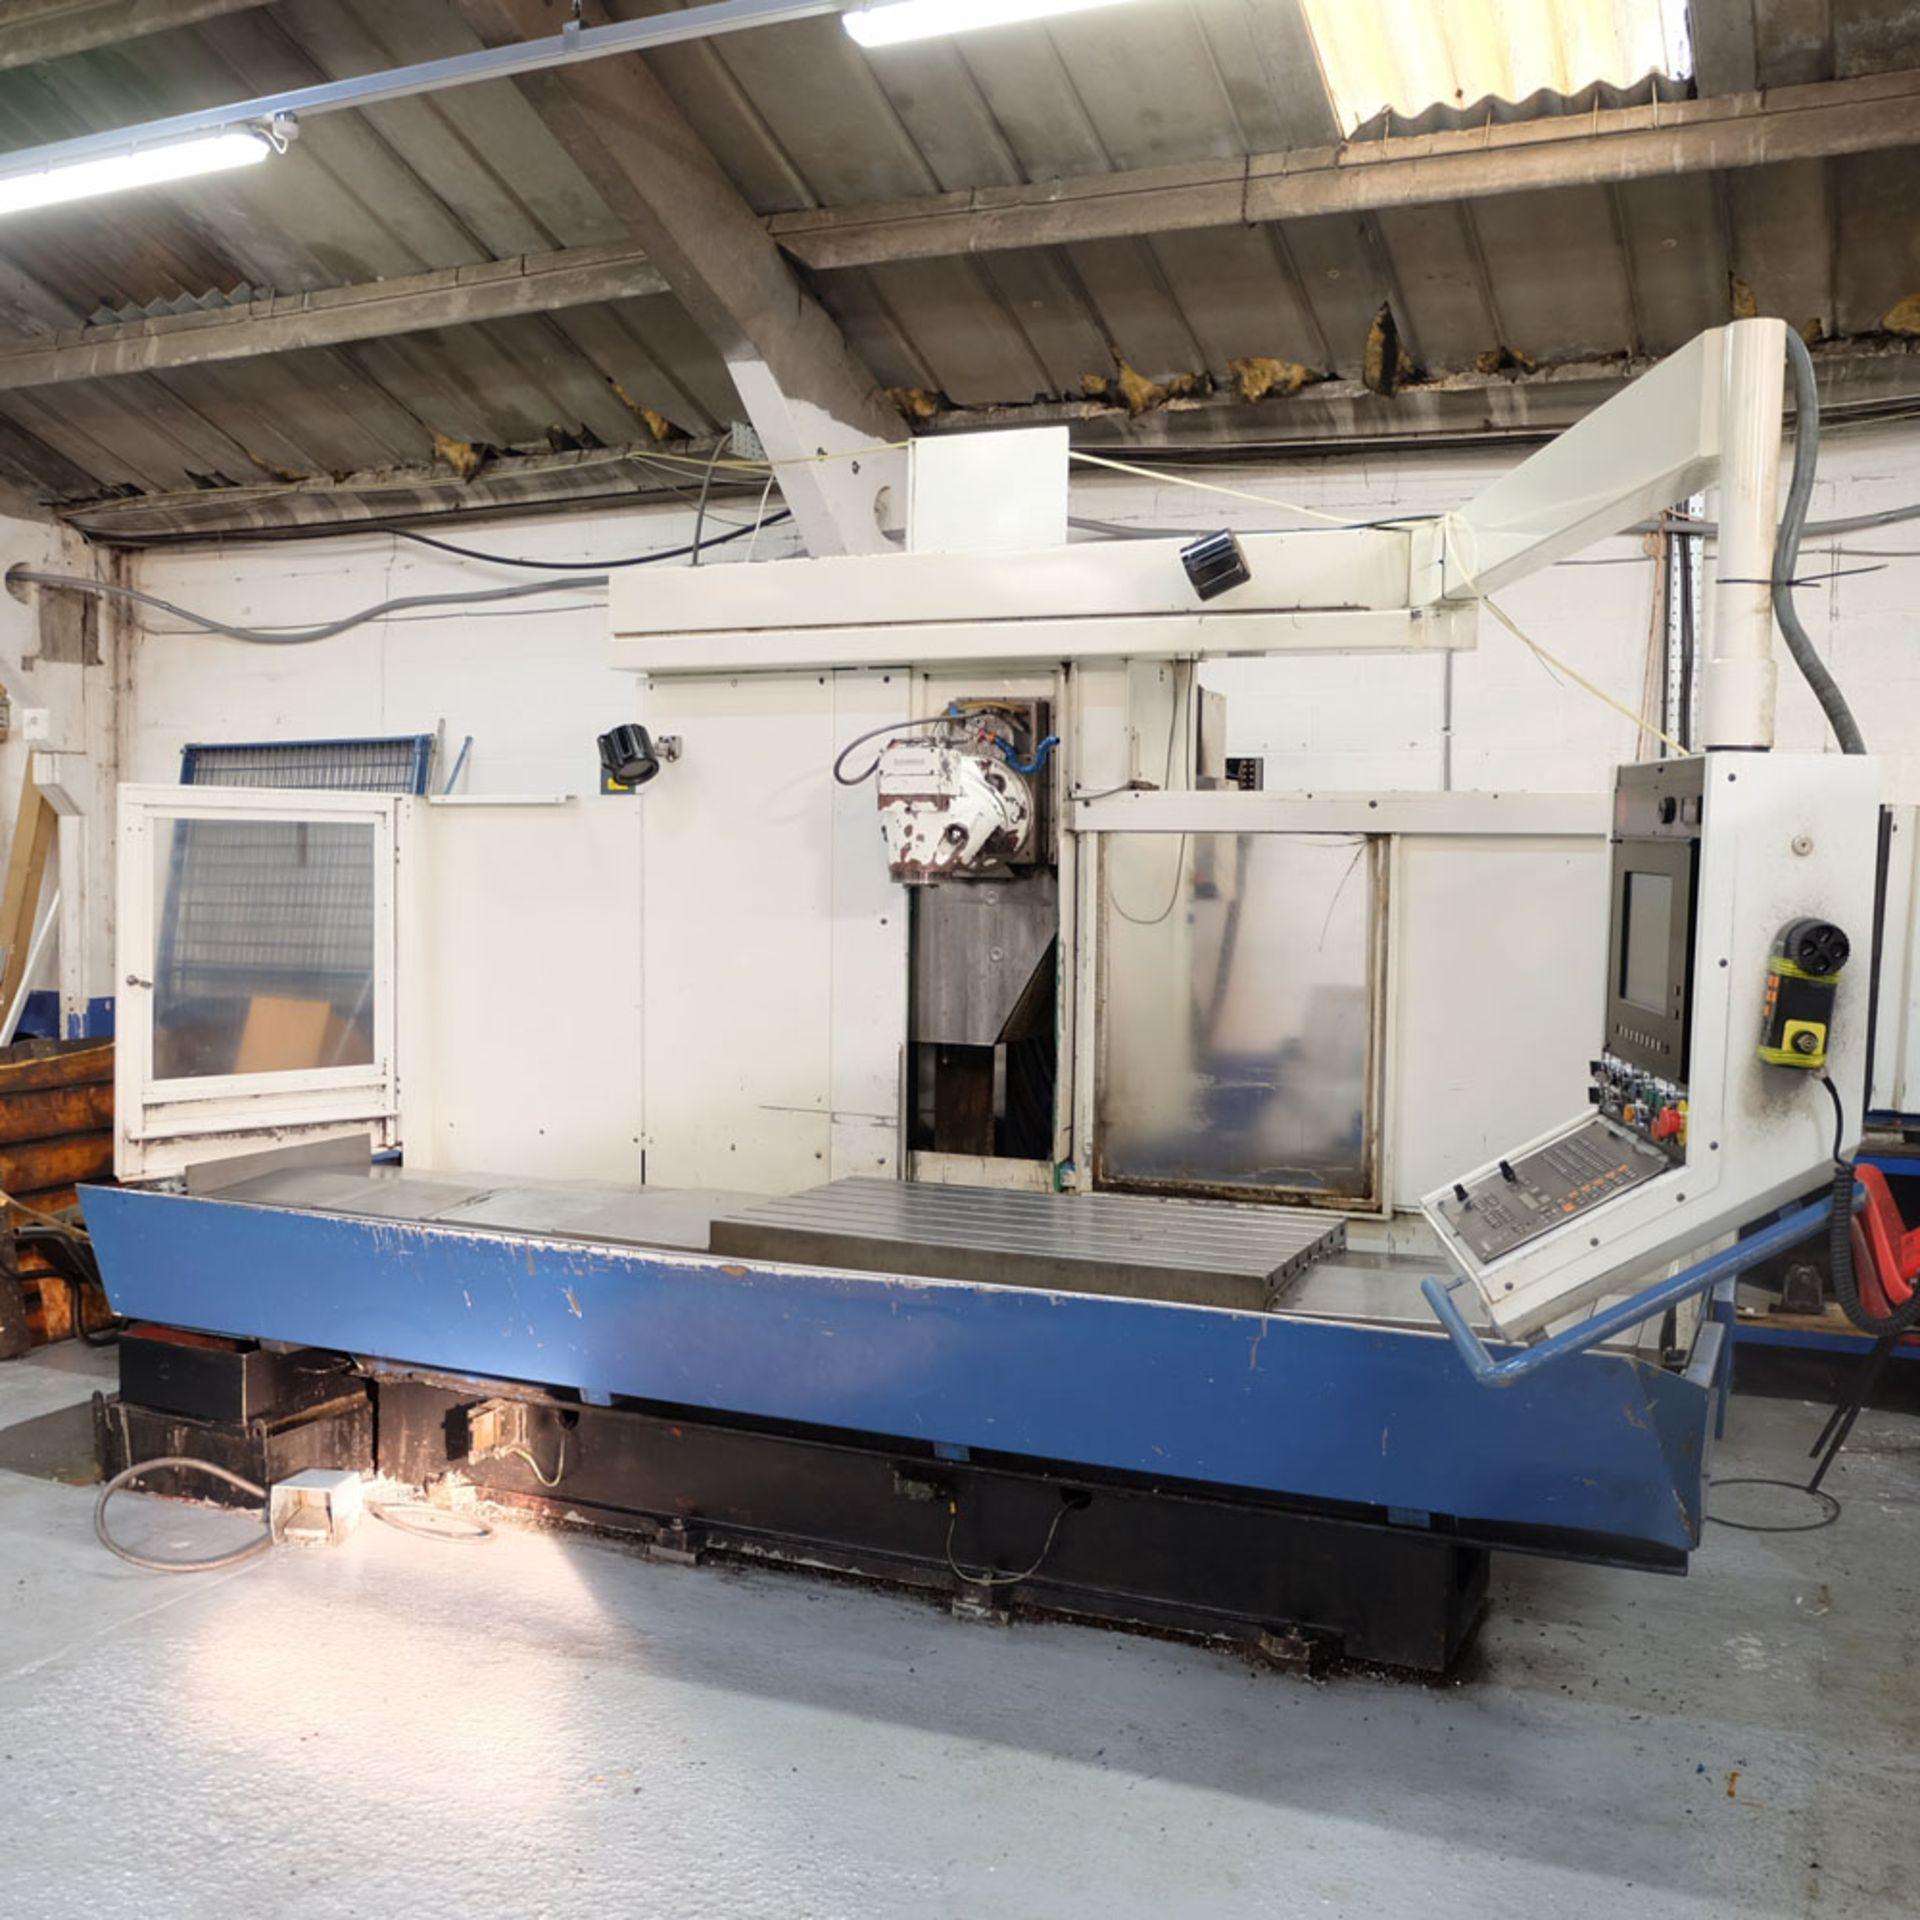 Huron GX 411 F Bed Type Milling Machine. Control Unit: CNC (HEIDENHAIN TNC 415B) - Image 2 of 12